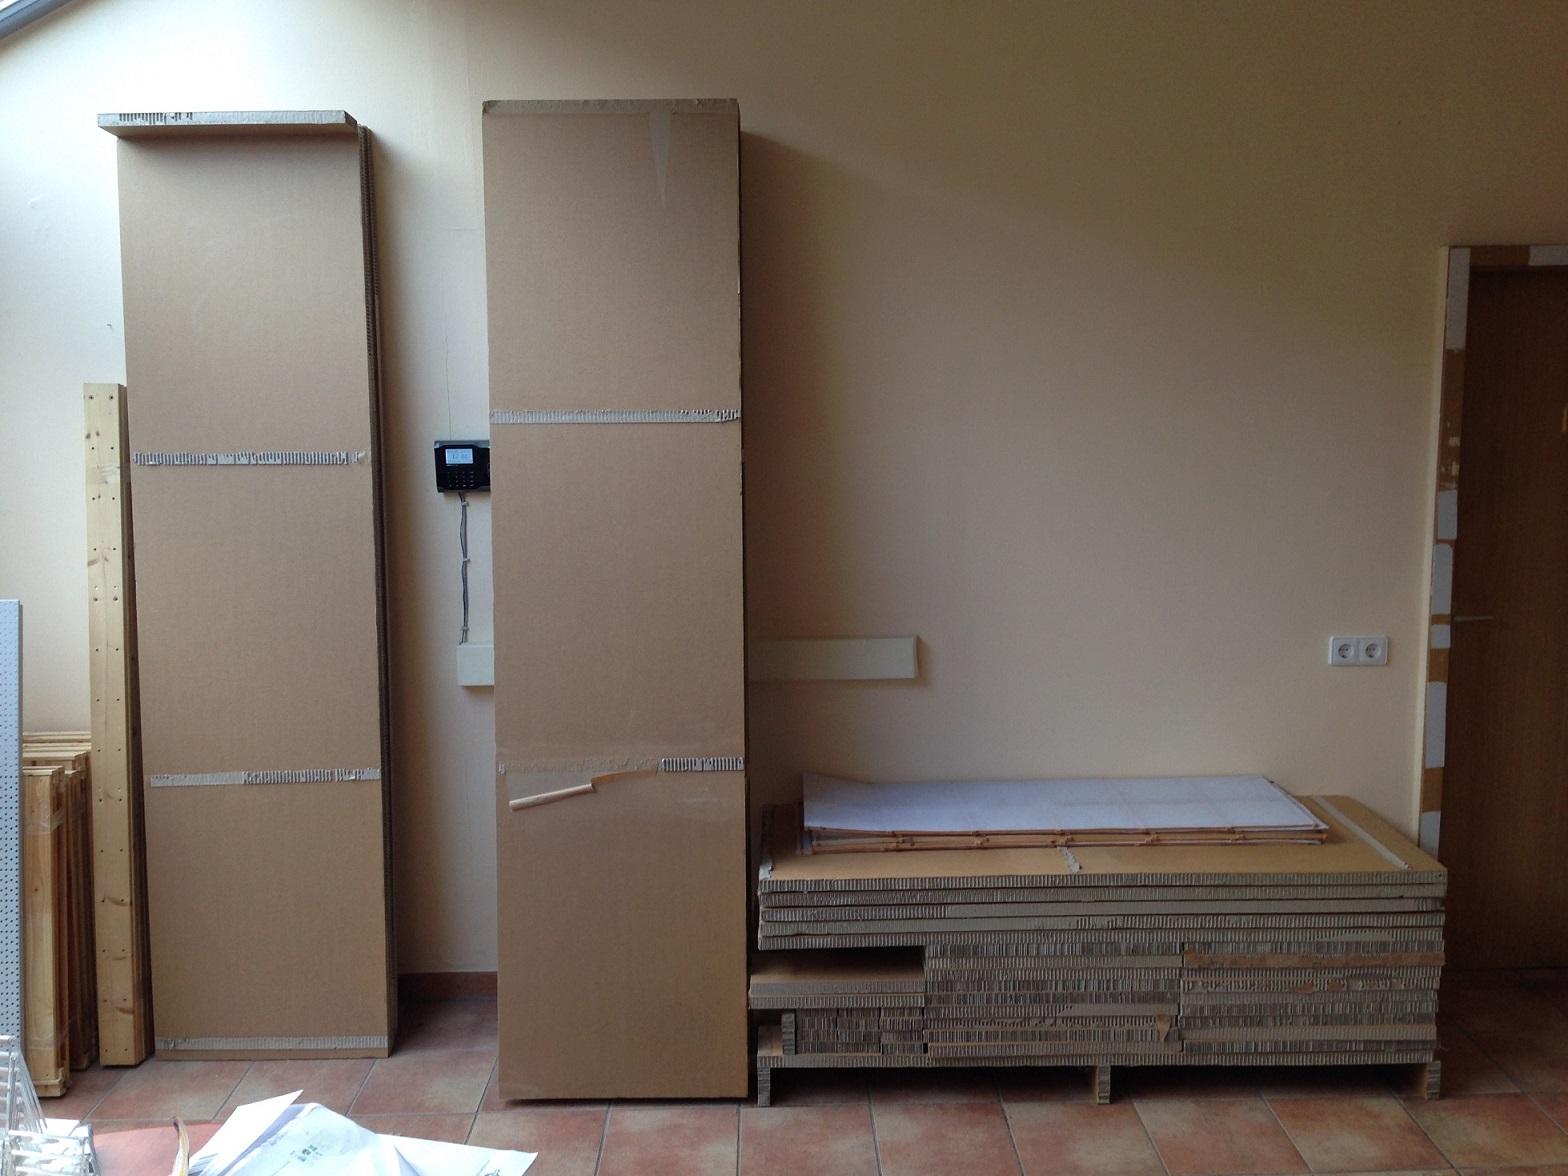 xxl pappregal regal verkaufsregal ladenregal stabil unikat. Black Bedroom Furniture Sets. Home Design Ideas